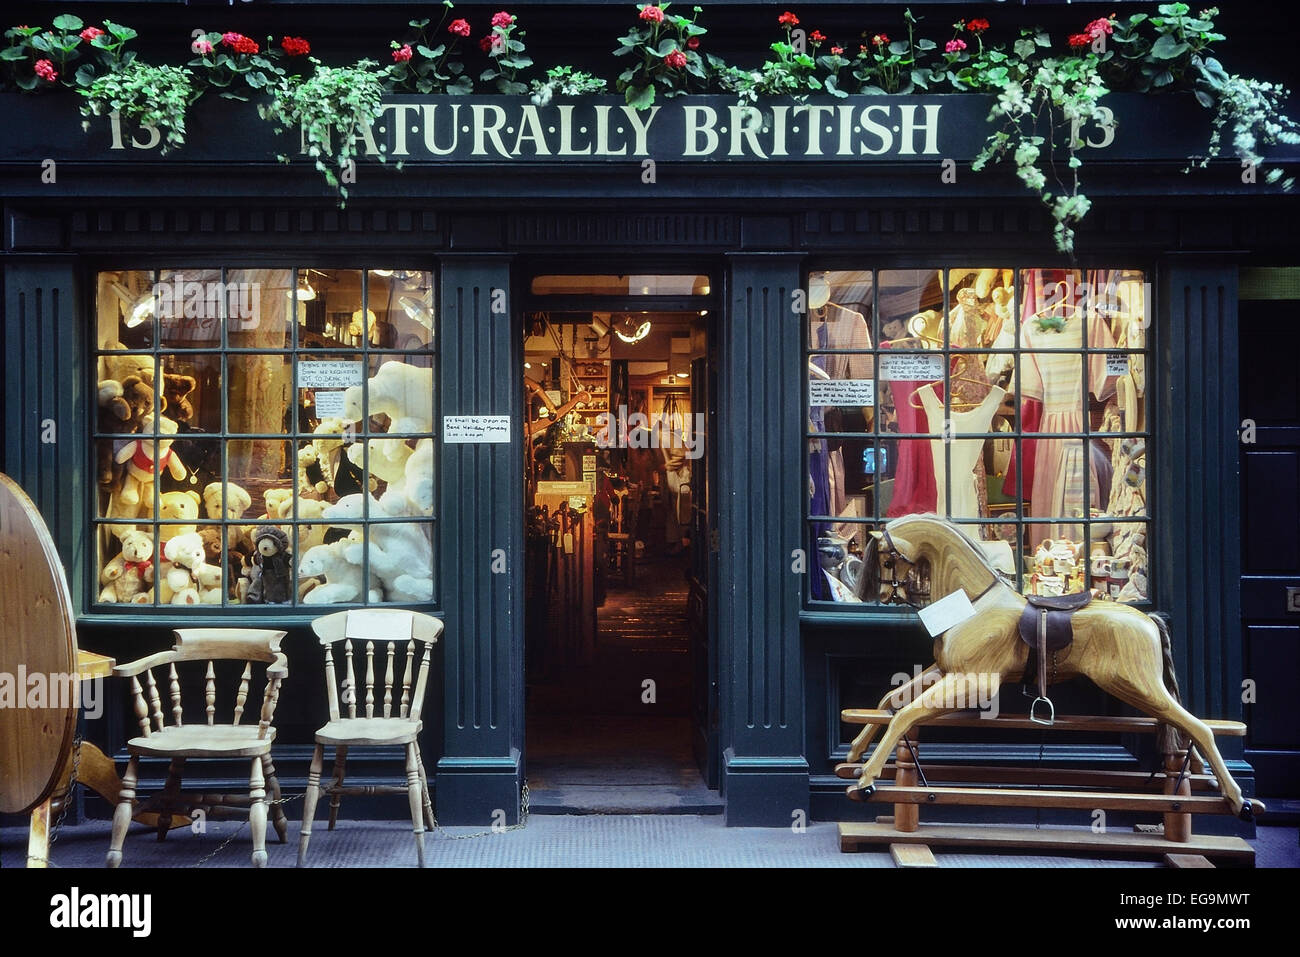 Natürlich British Shop Fassade. London. UK Stockbild